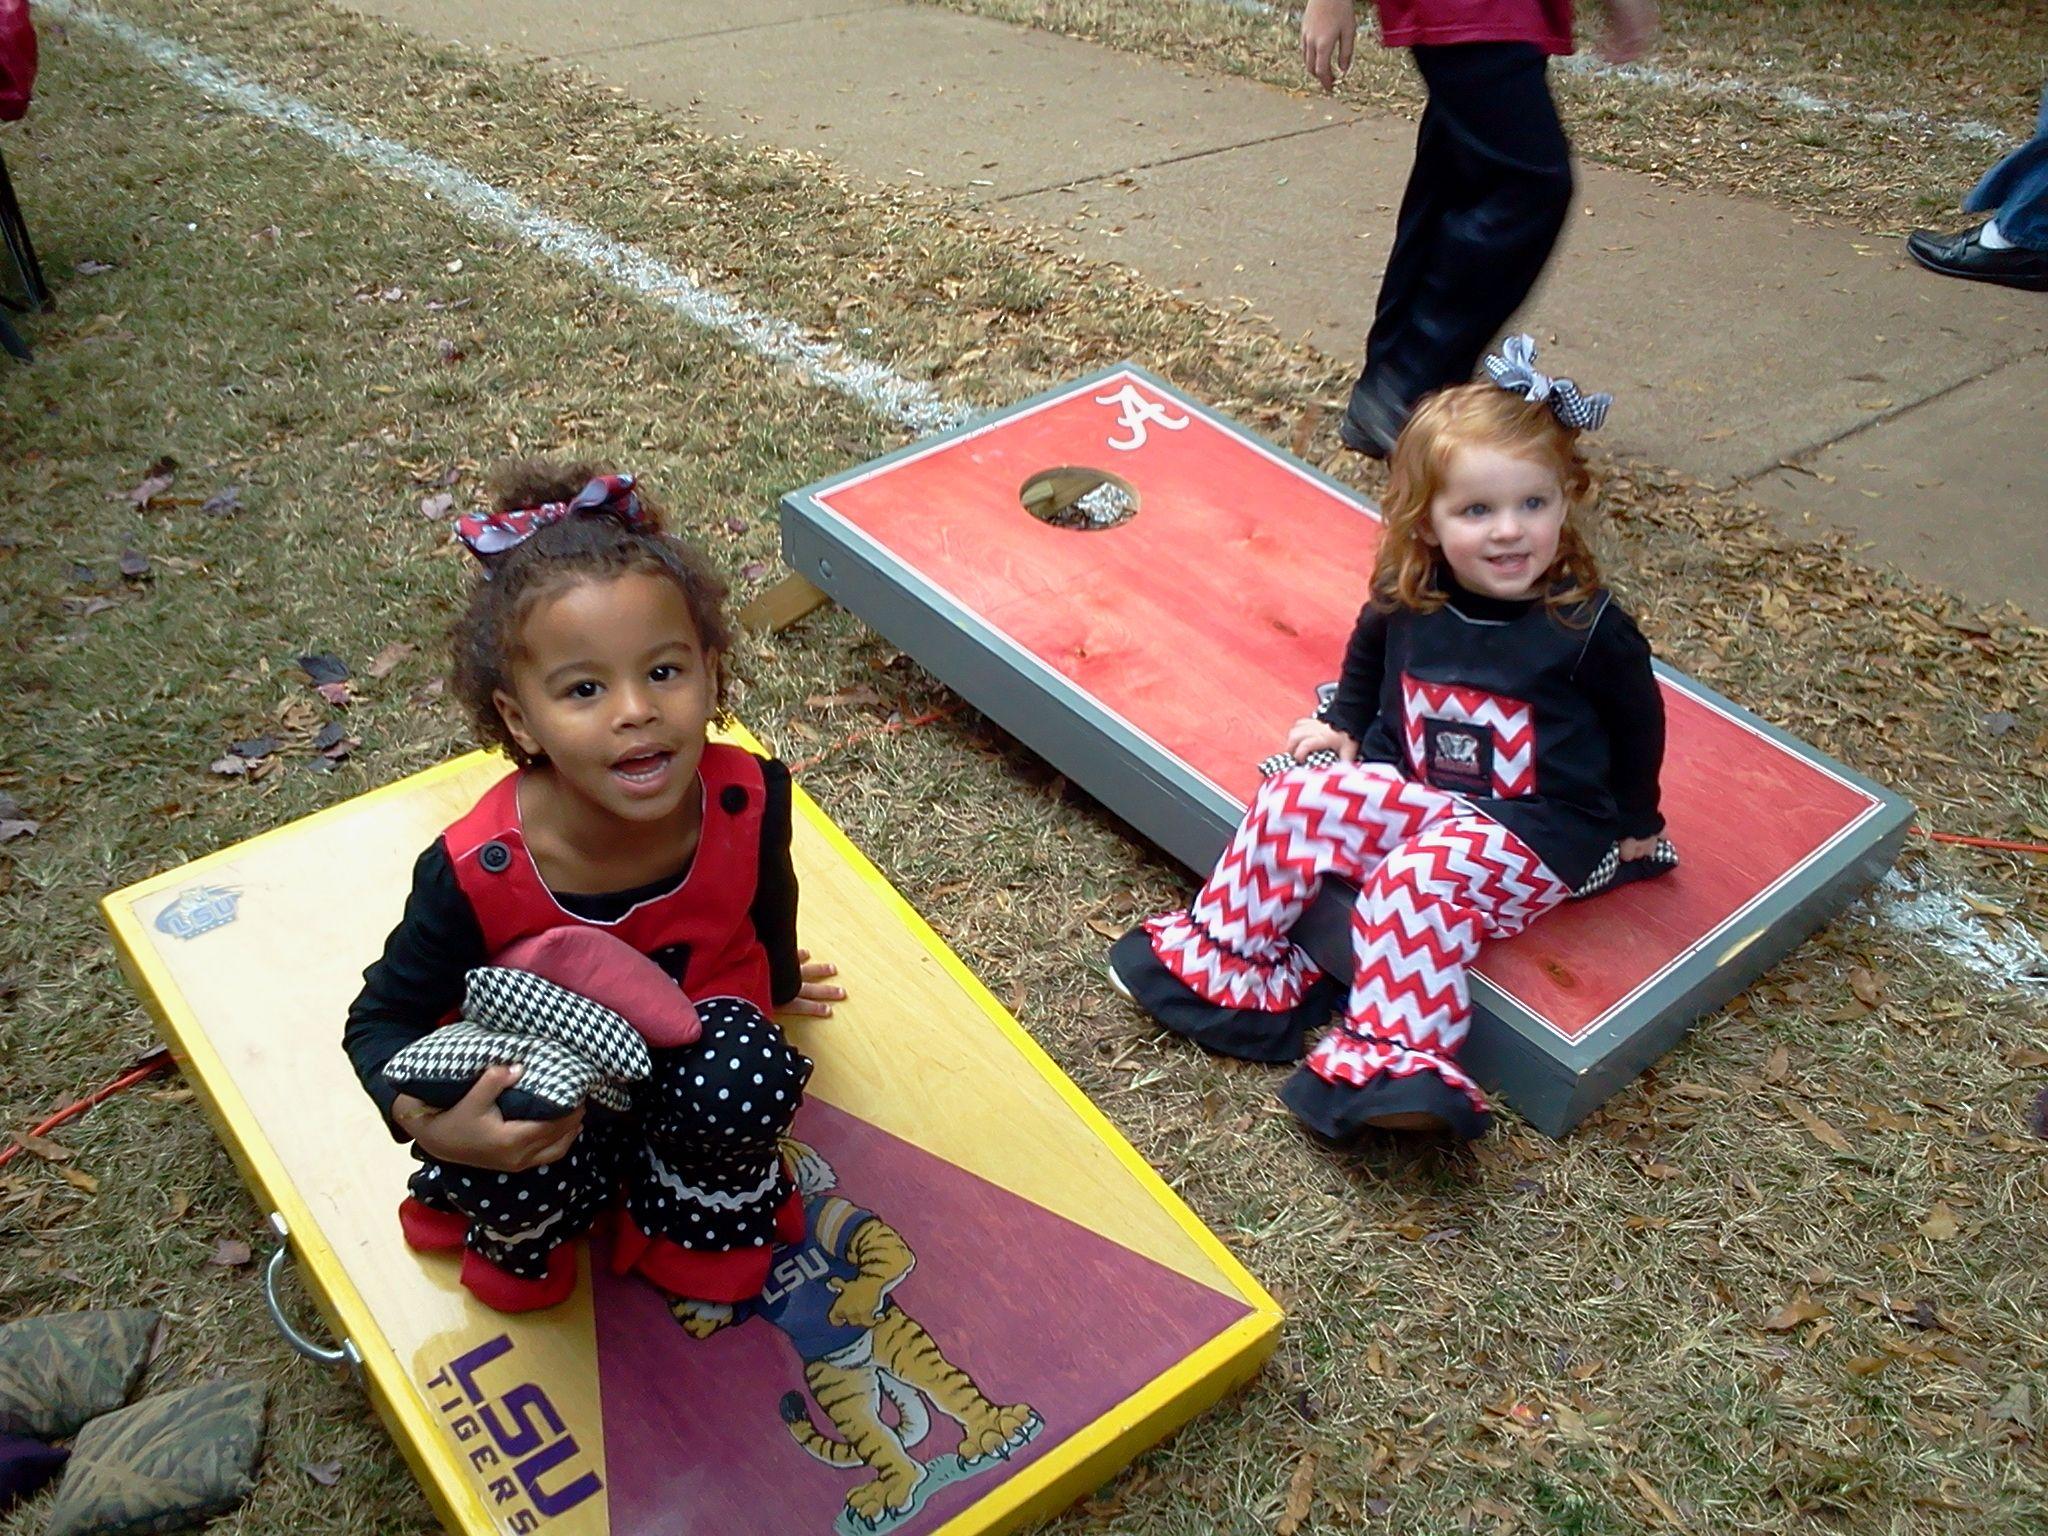 Cutest little fans | Lsu vs bama, Gameday outfit, Cute